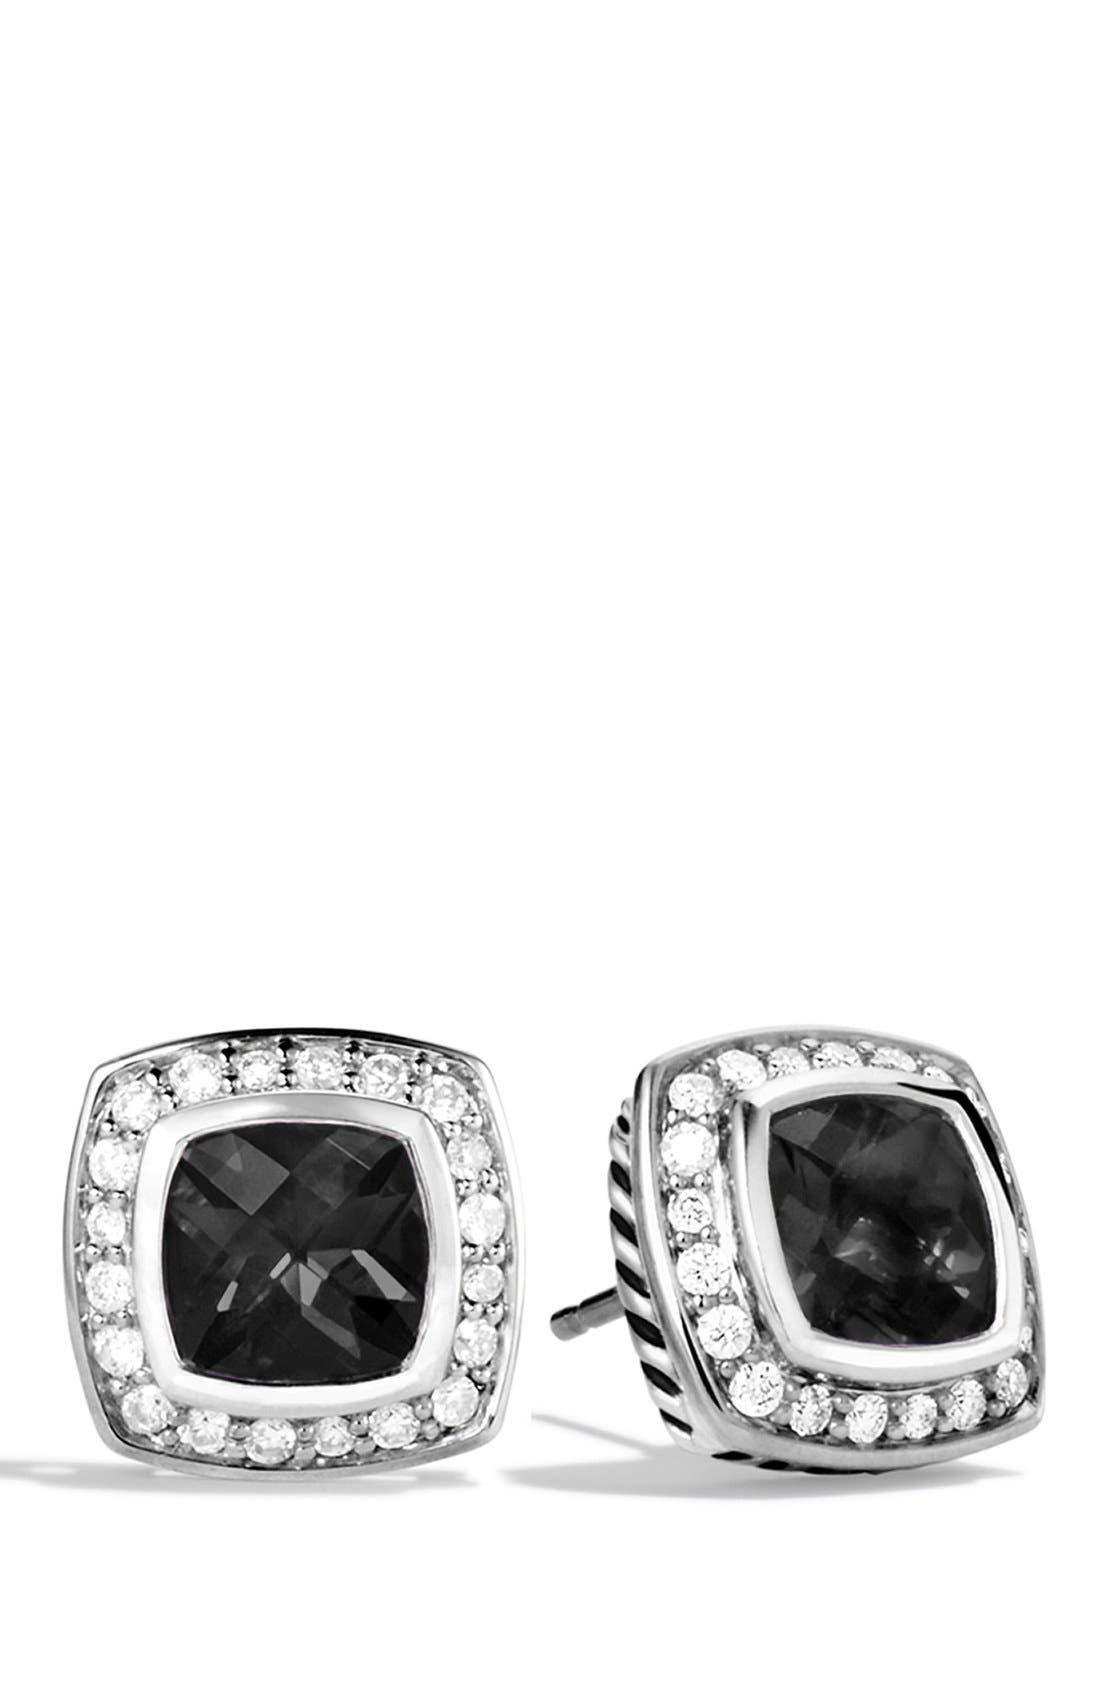 'Albion' Petite Earrings with Semiprecious Stones & Diamonds,                             Main thumbnail 2, color,